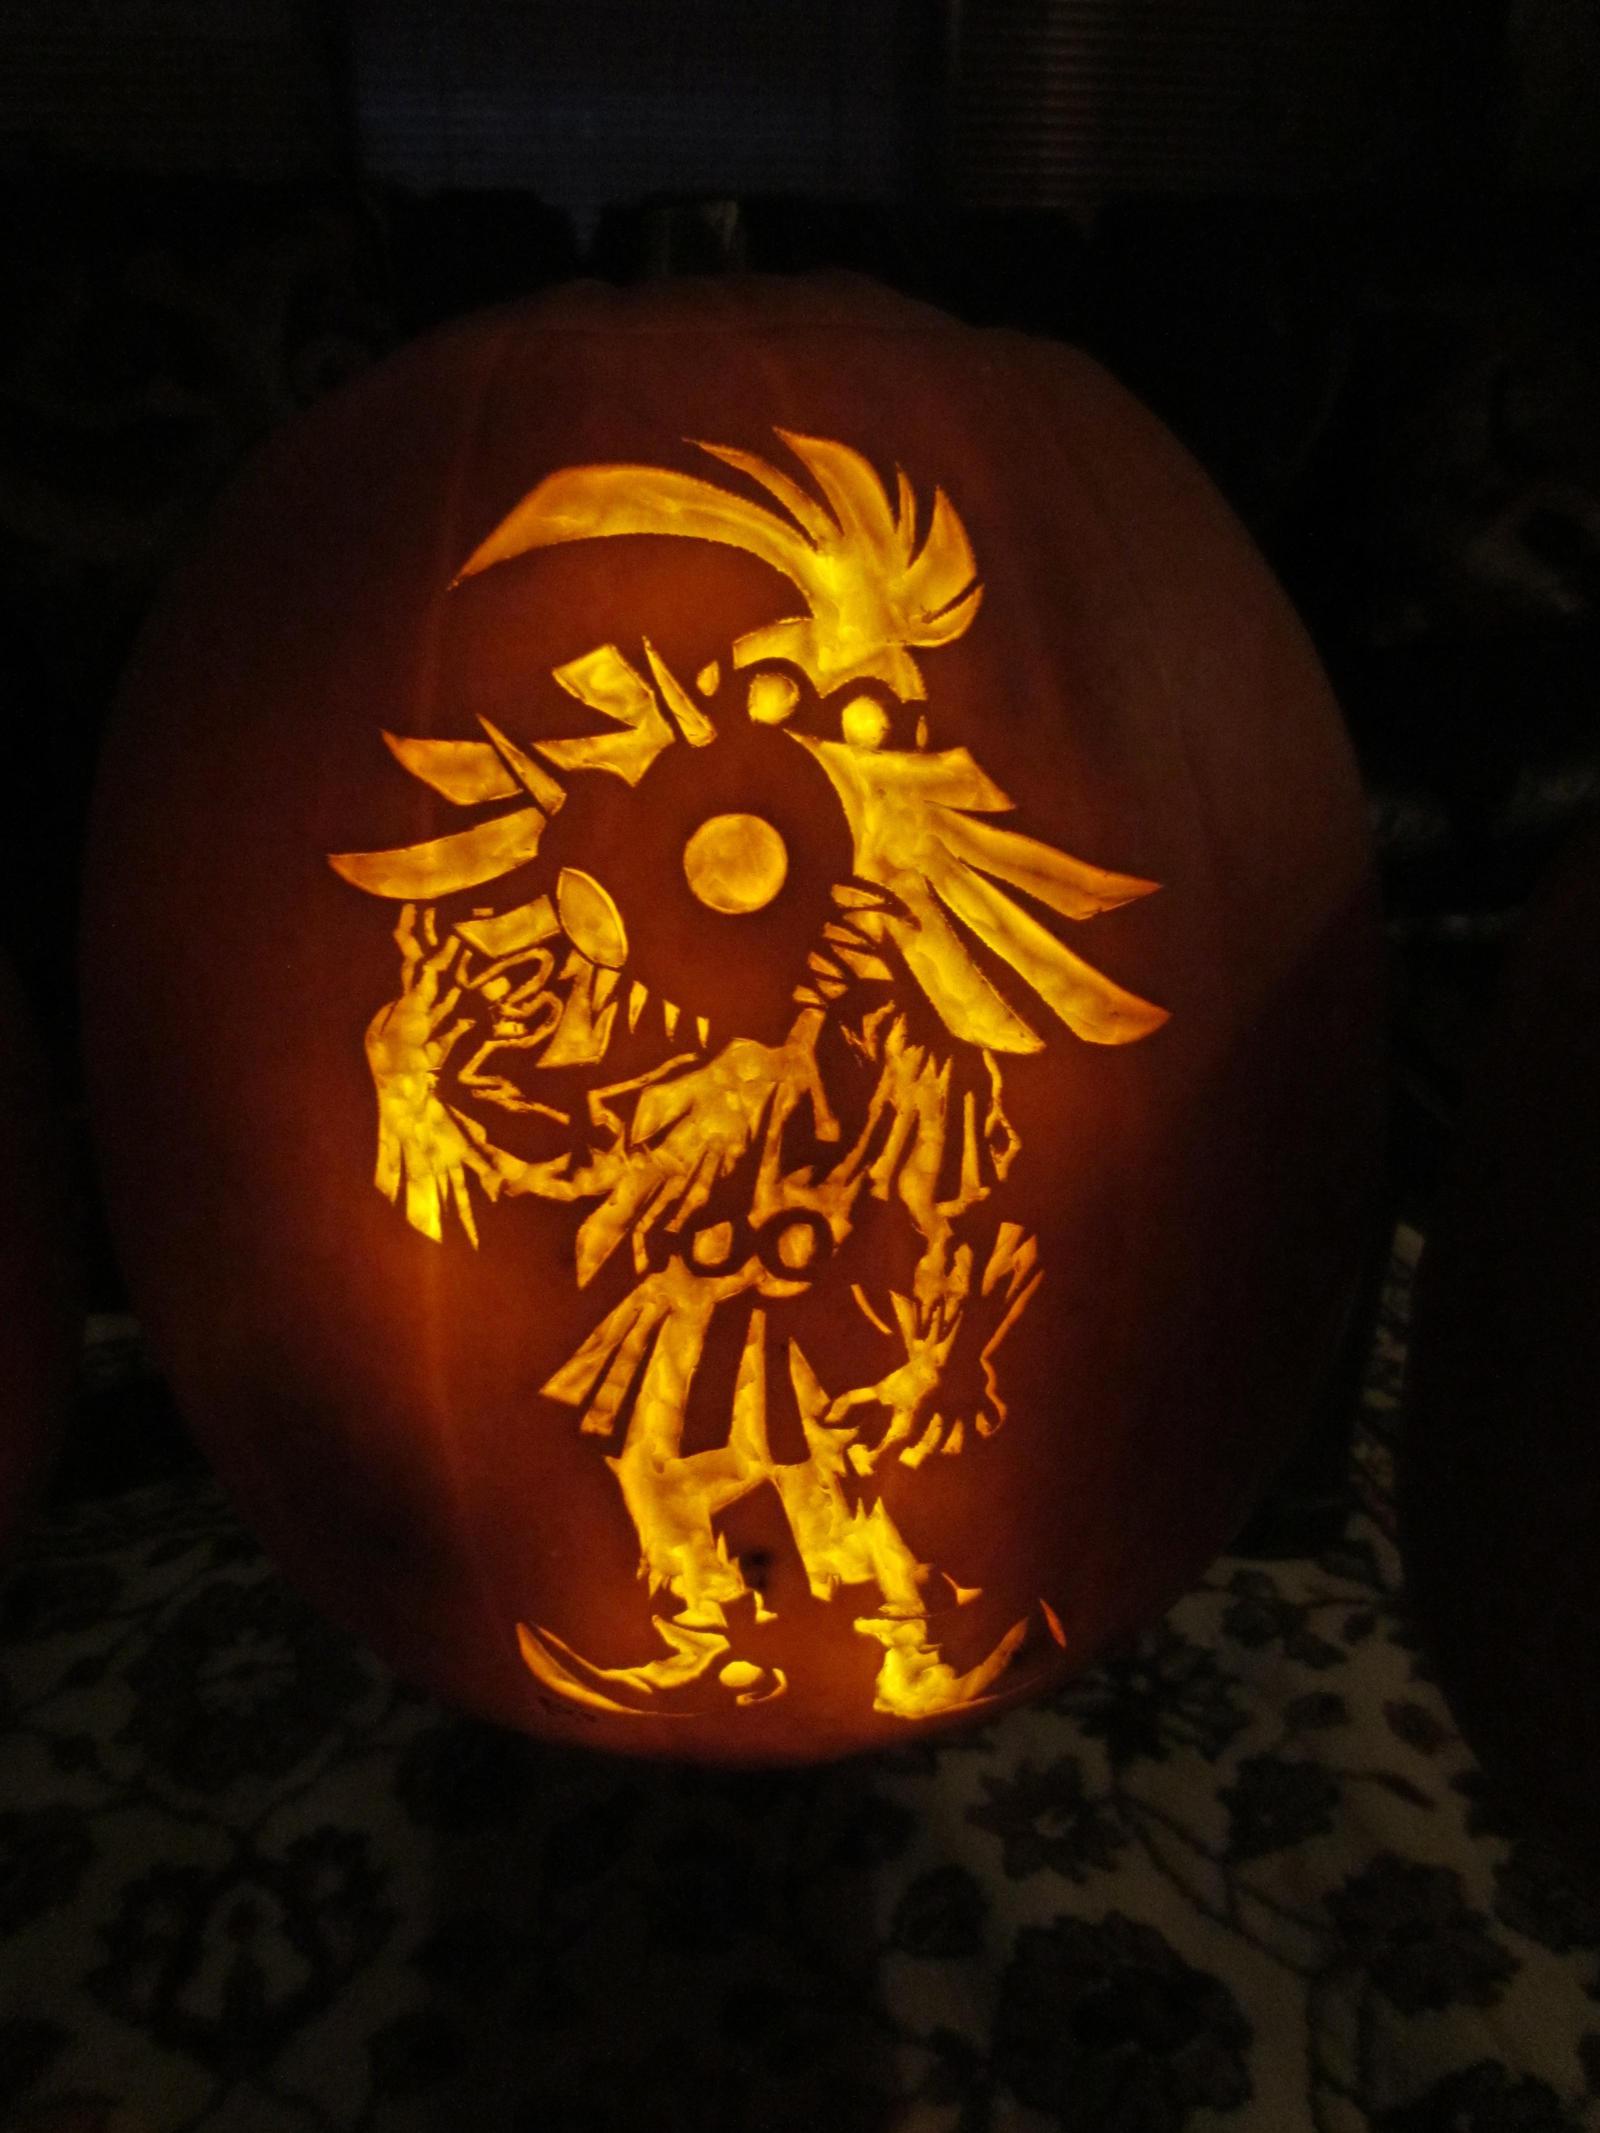 Skull Kid Pumpkin (2012) by DimSumDragon on DeviantArt